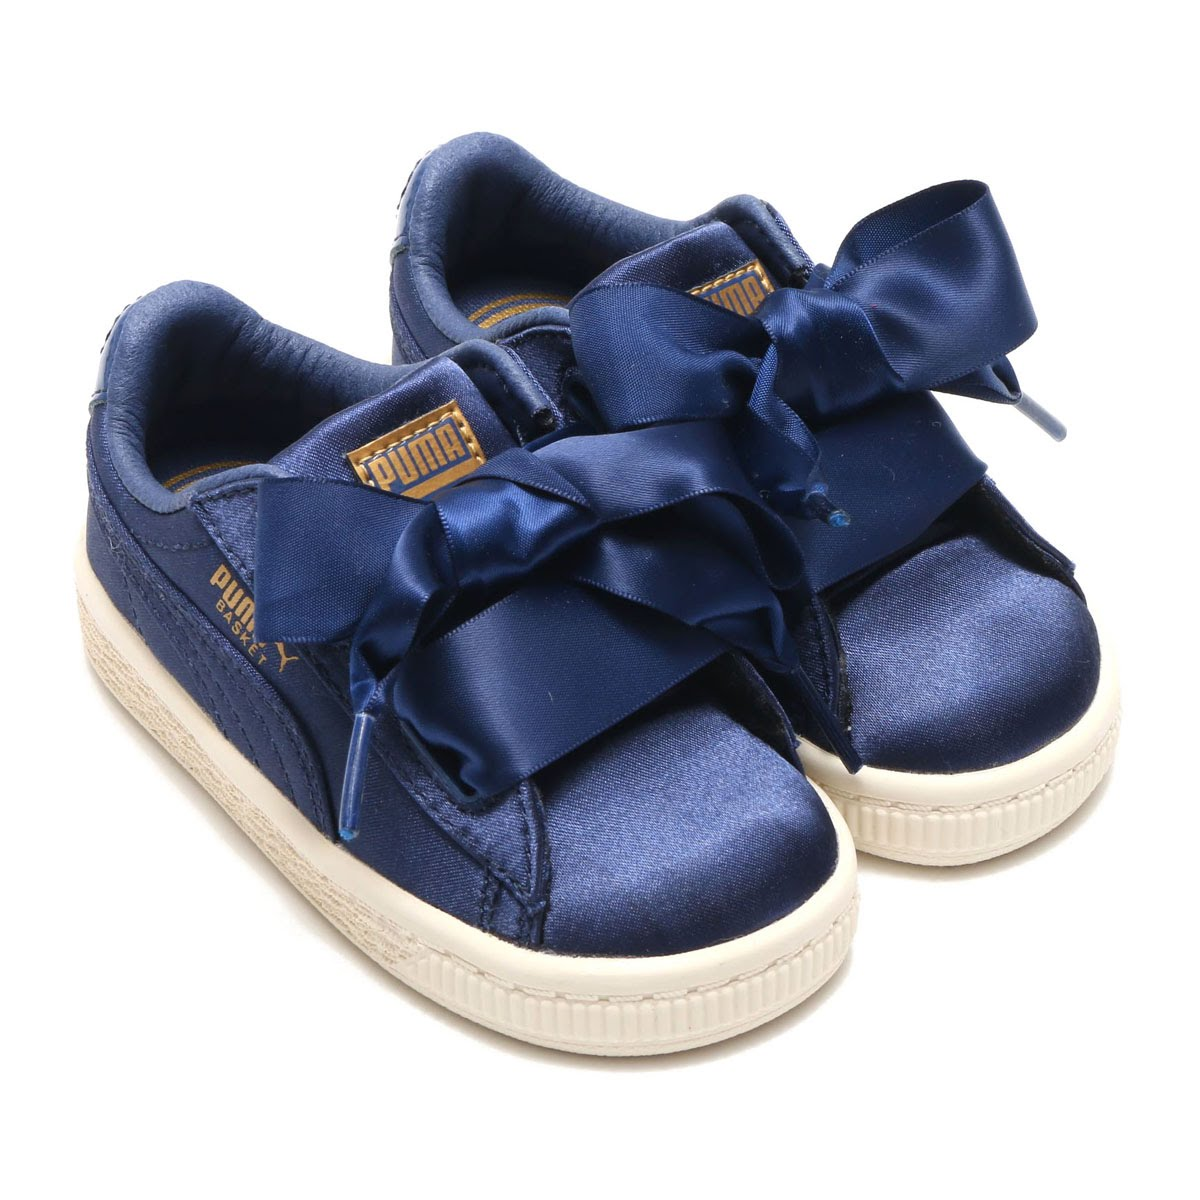 sale retailer 0977c e23b1 PUMA BASKET HEART TWEEN INFANT (プーマバスケットハートトゥイーンインファント) SARGASSO SEA 18SP-I